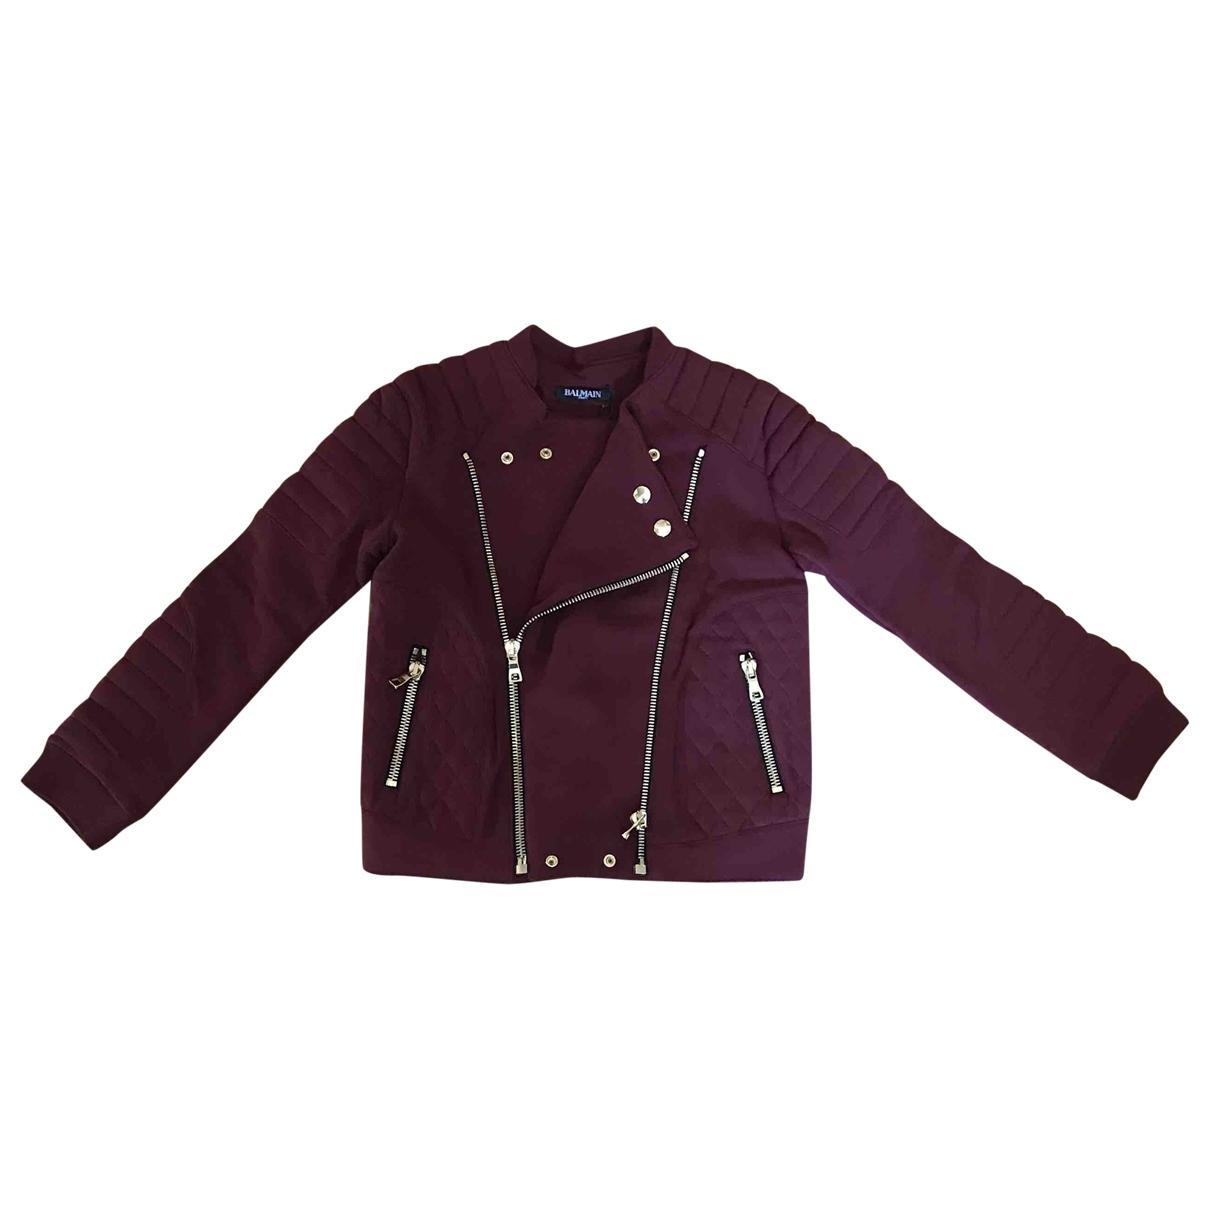 Balmain \N Burgundy Cotton jacket & coat for Kids 10 years - up to 142cm FR